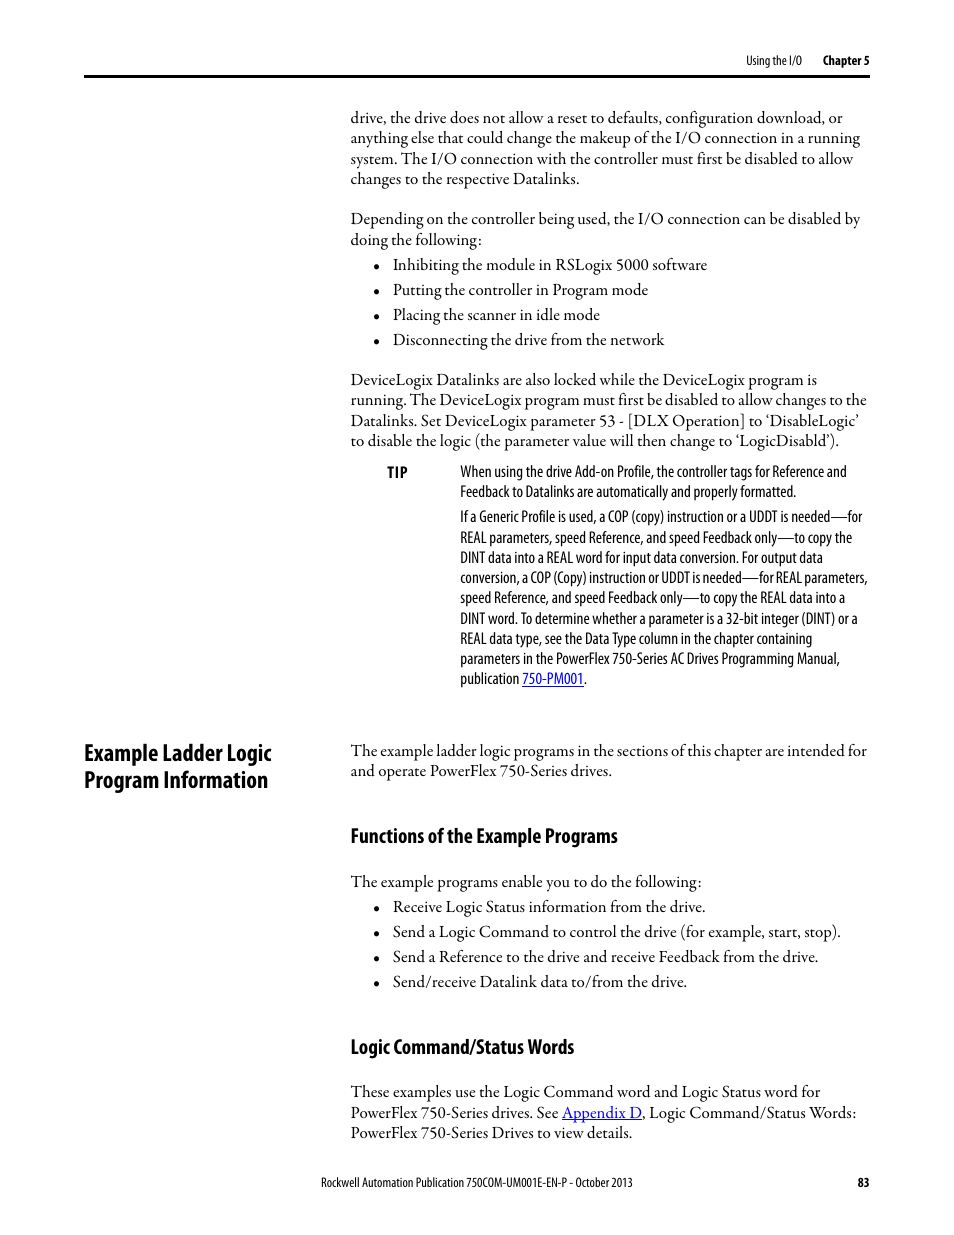 example ladder logic program information functions of the example rh manualsdir com Motorola DS9208 Scanner Programming Motorola Programming Software